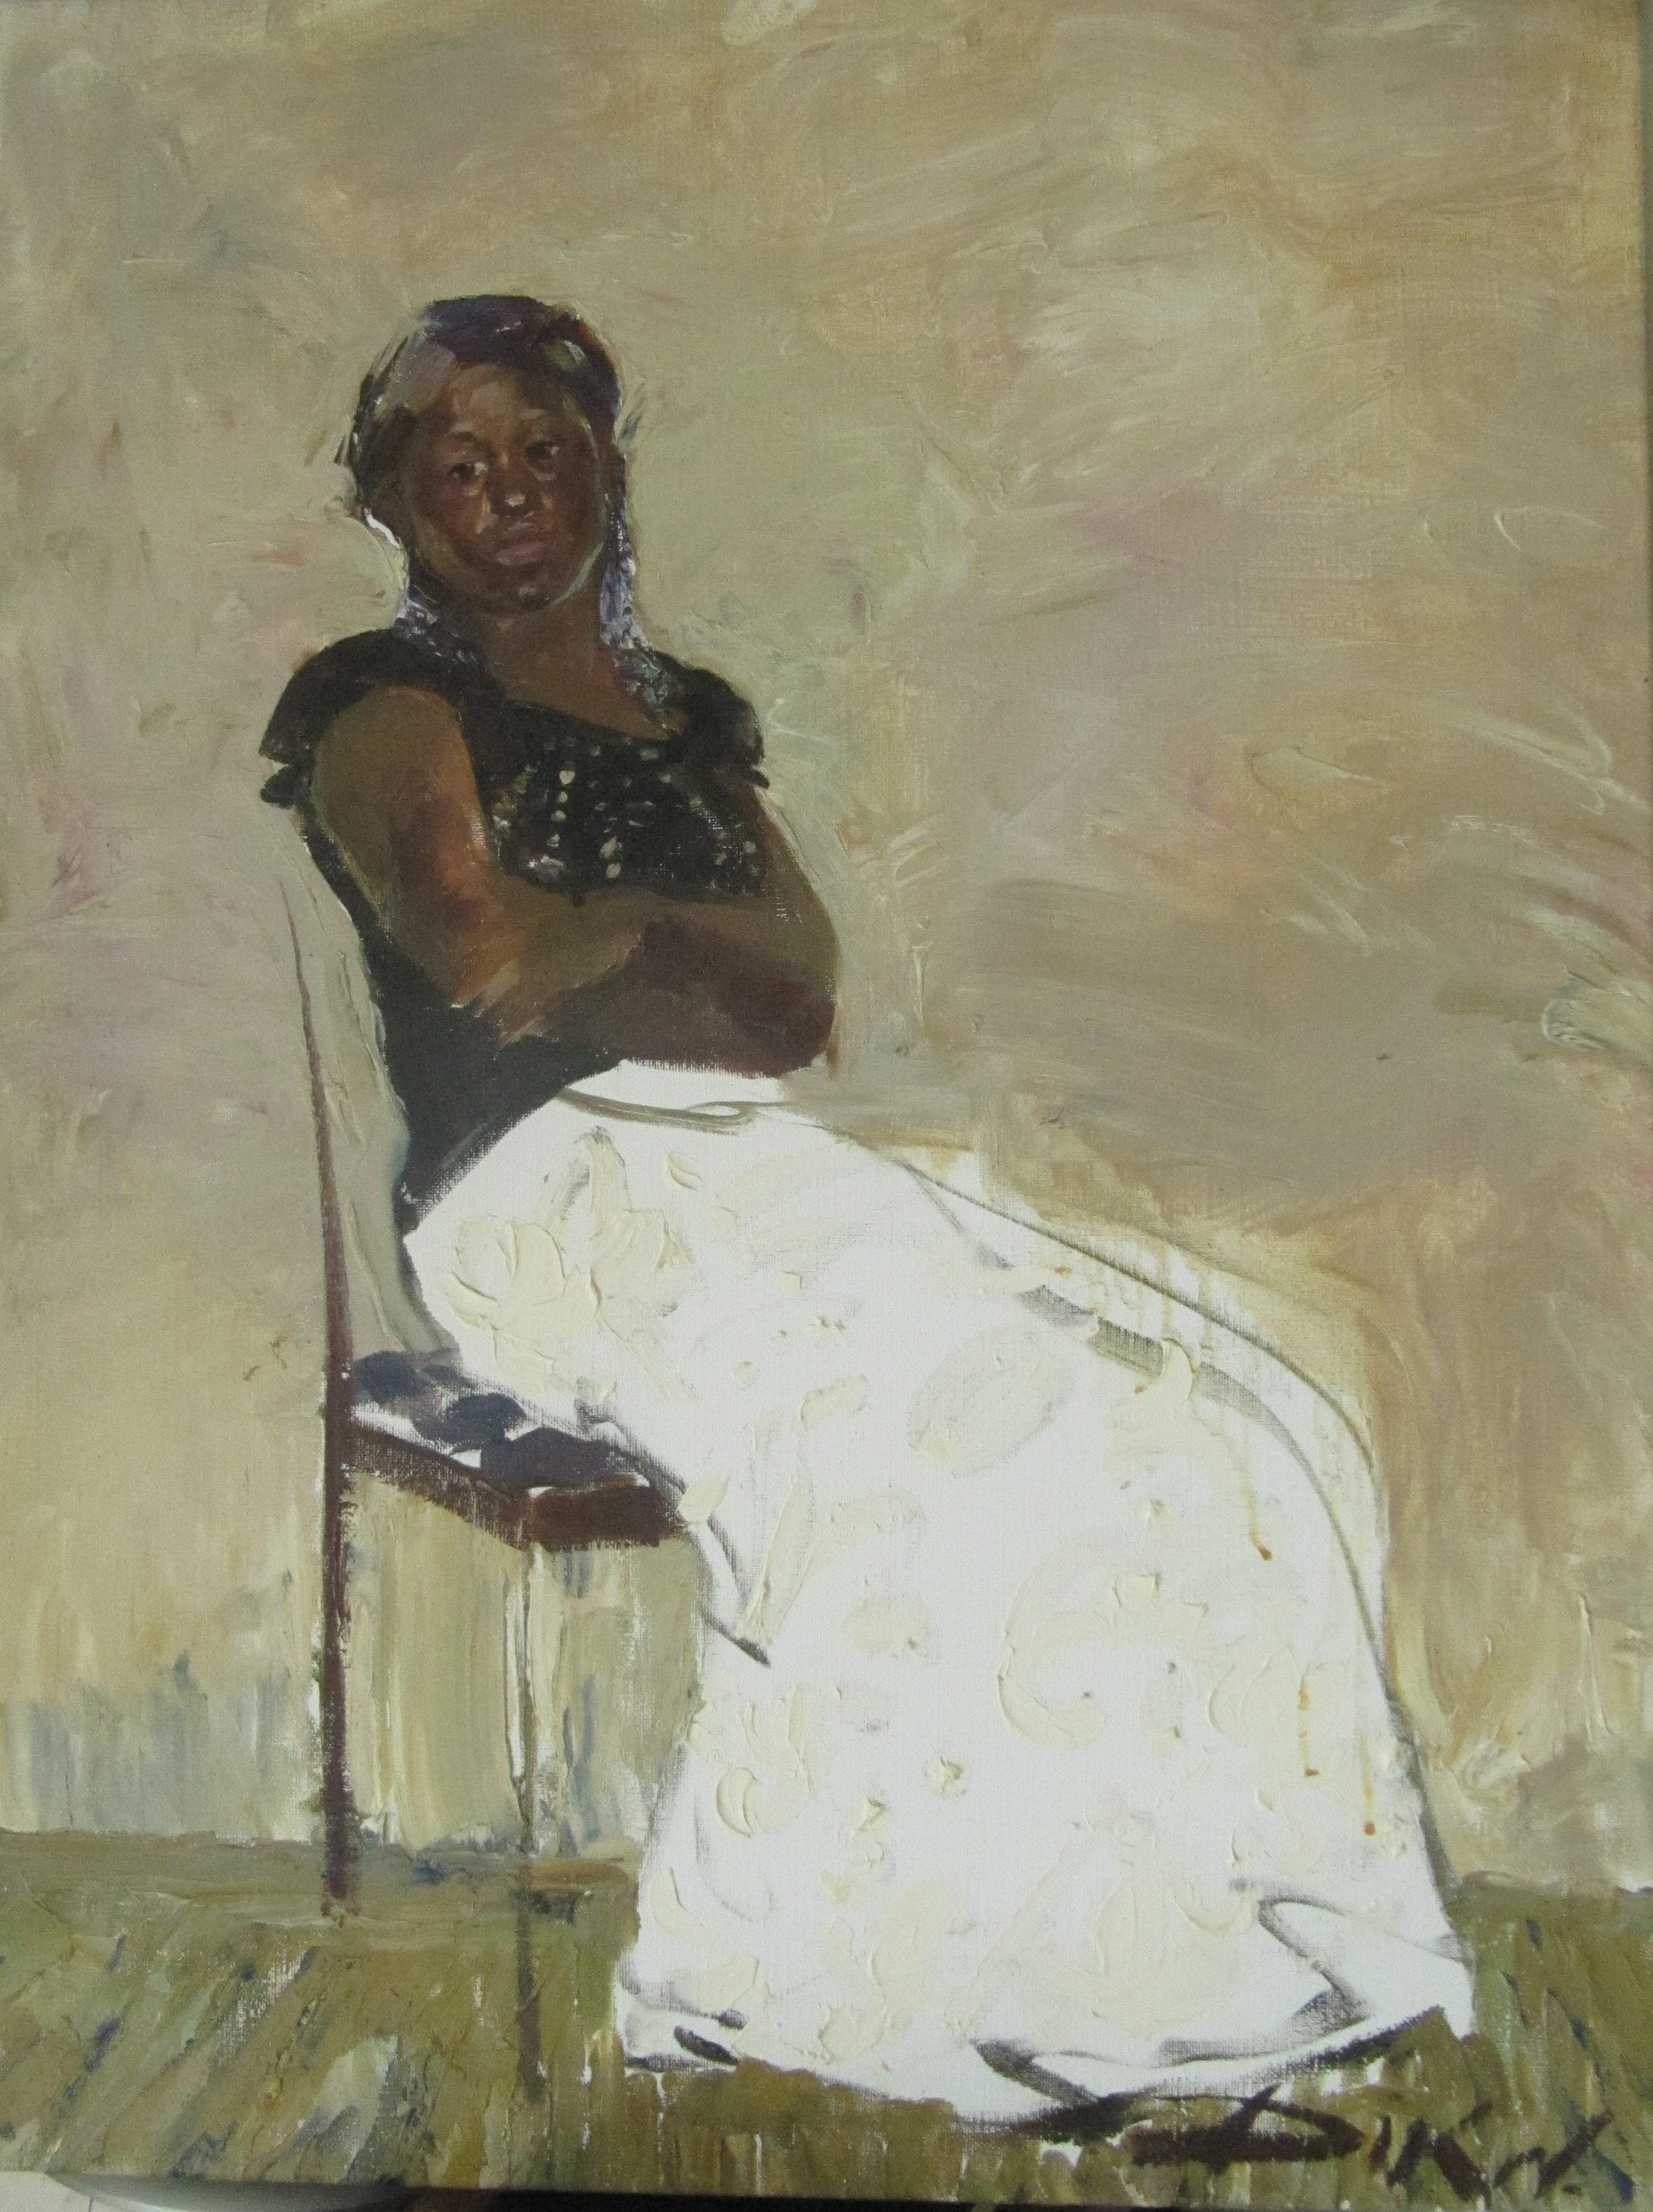 Natalia dik    portret  olieverf   80 x 60  e. 1800 00